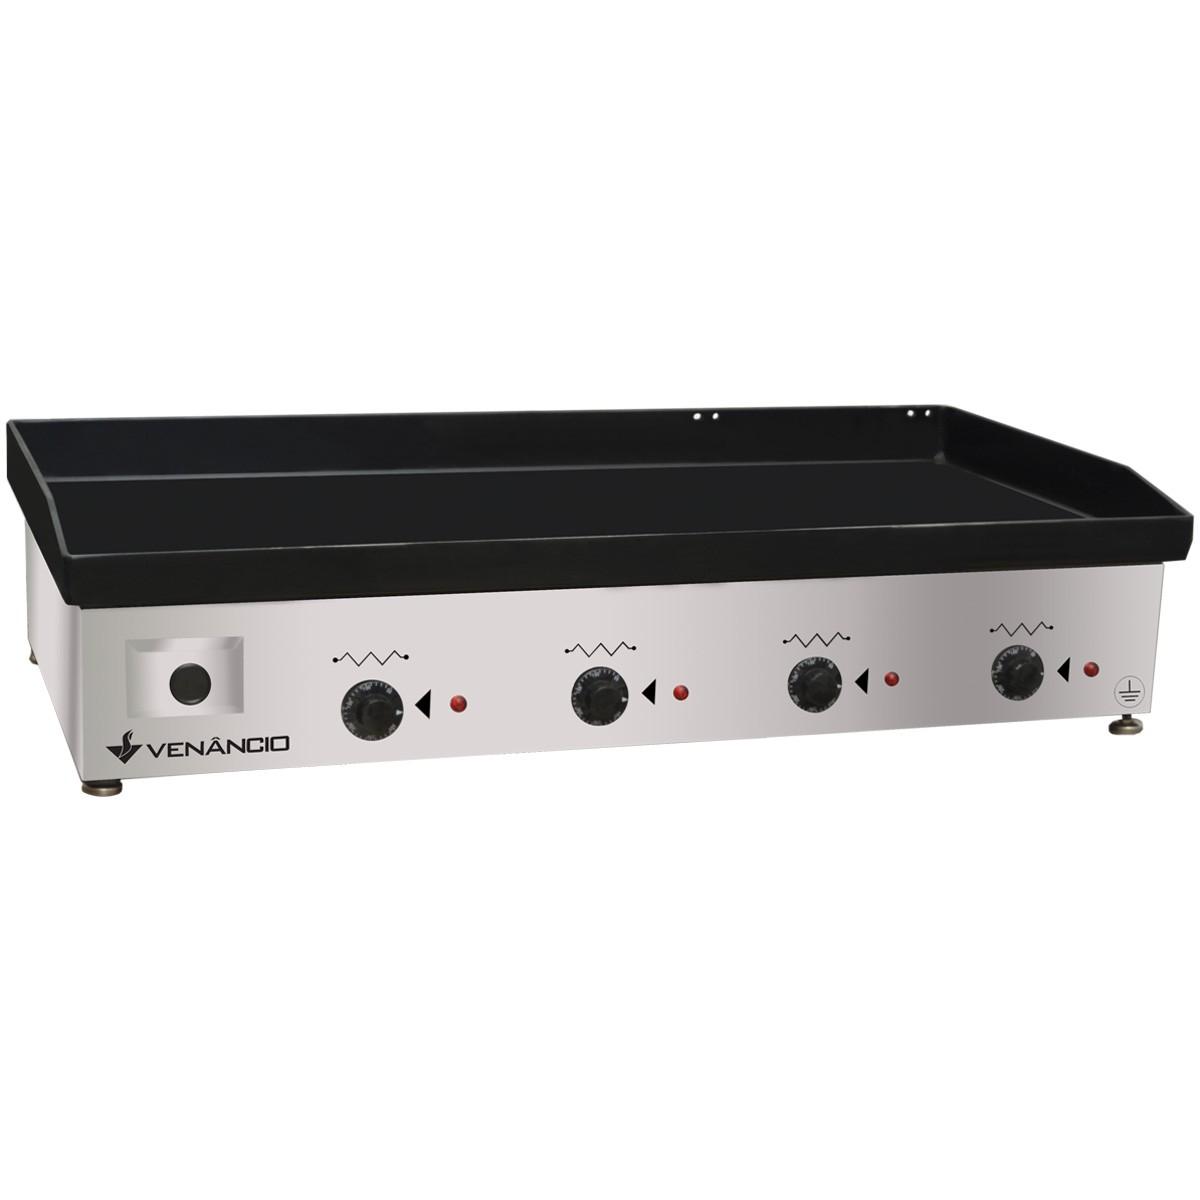 CHAPA ELET INOX ESCOV MOD 650-220V VENANCIO